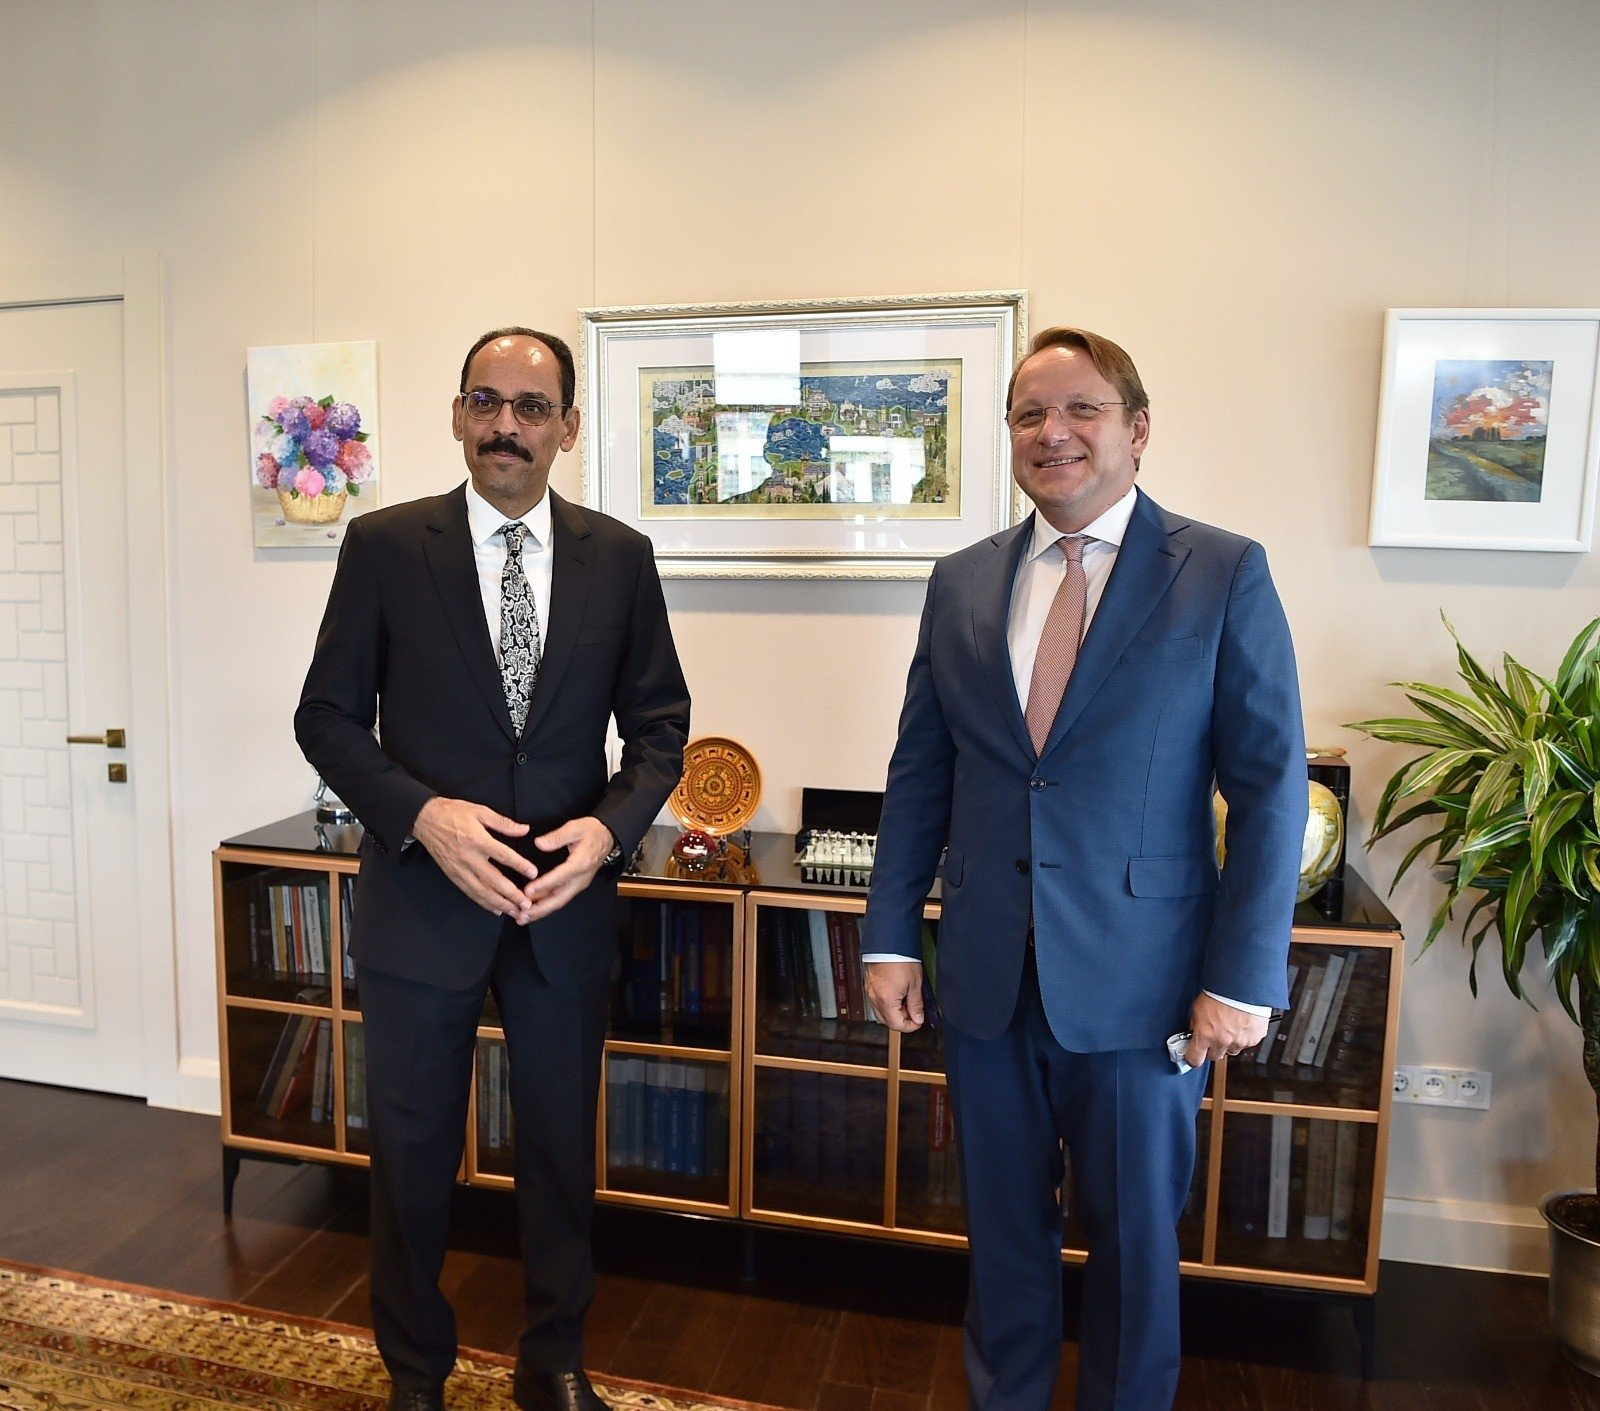 Turkish Presidential SpokespersonIbrahim Kalın (L) and the European Union's Neighborhood and Enlargement Commissioner Oliver Varhelyi meet in the capital Ankara, Turkey, Sept. 7, 2021. (AA Photo)